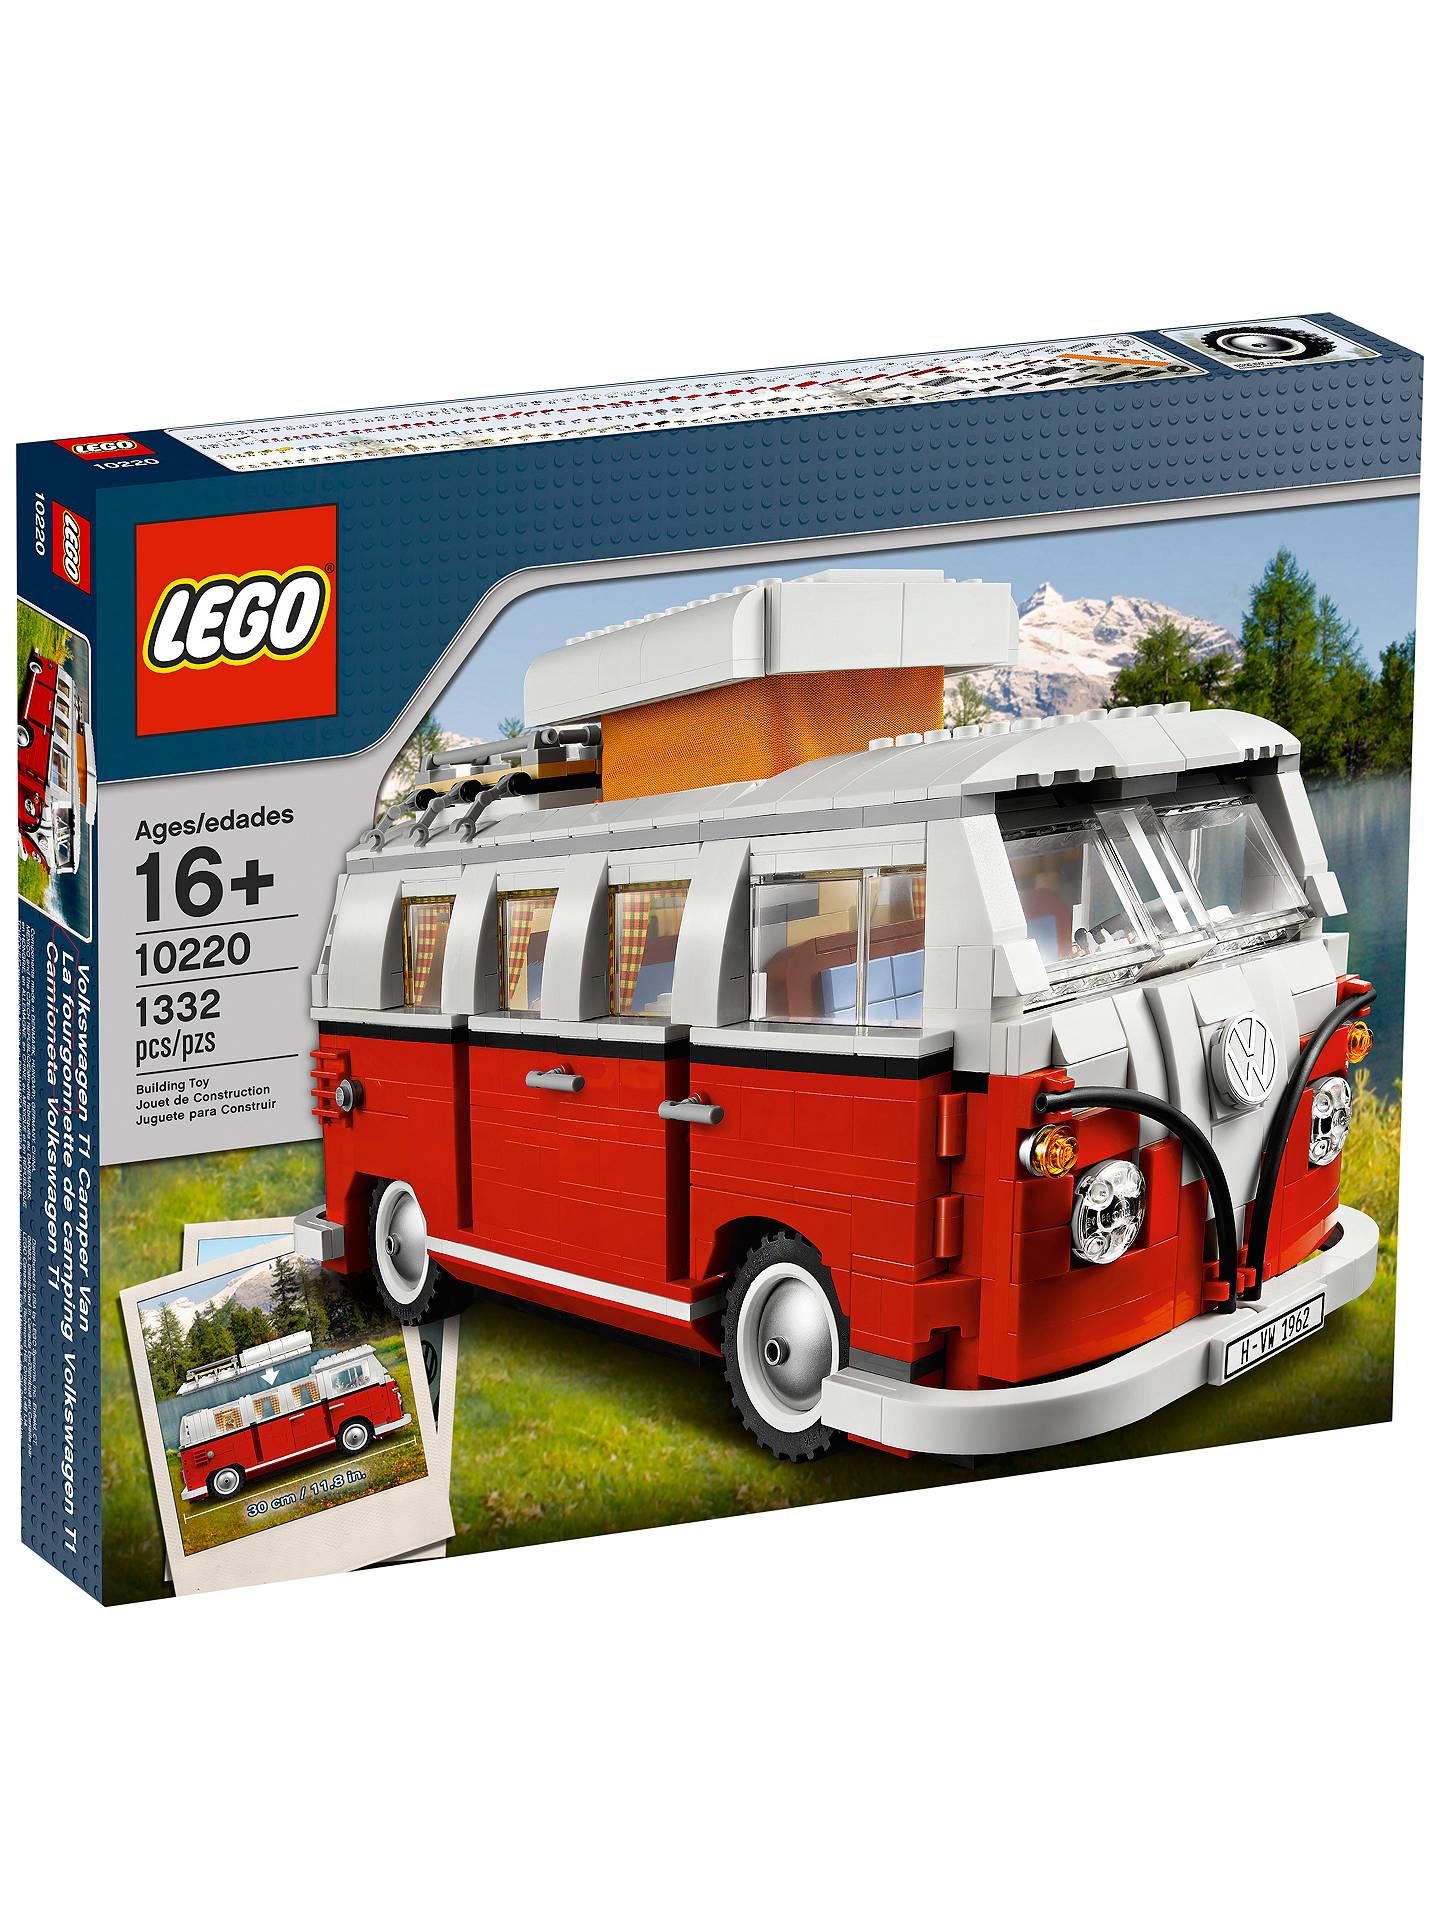 LEGO Creator 10220 VW Camper Van £72.24 @ John Lewis